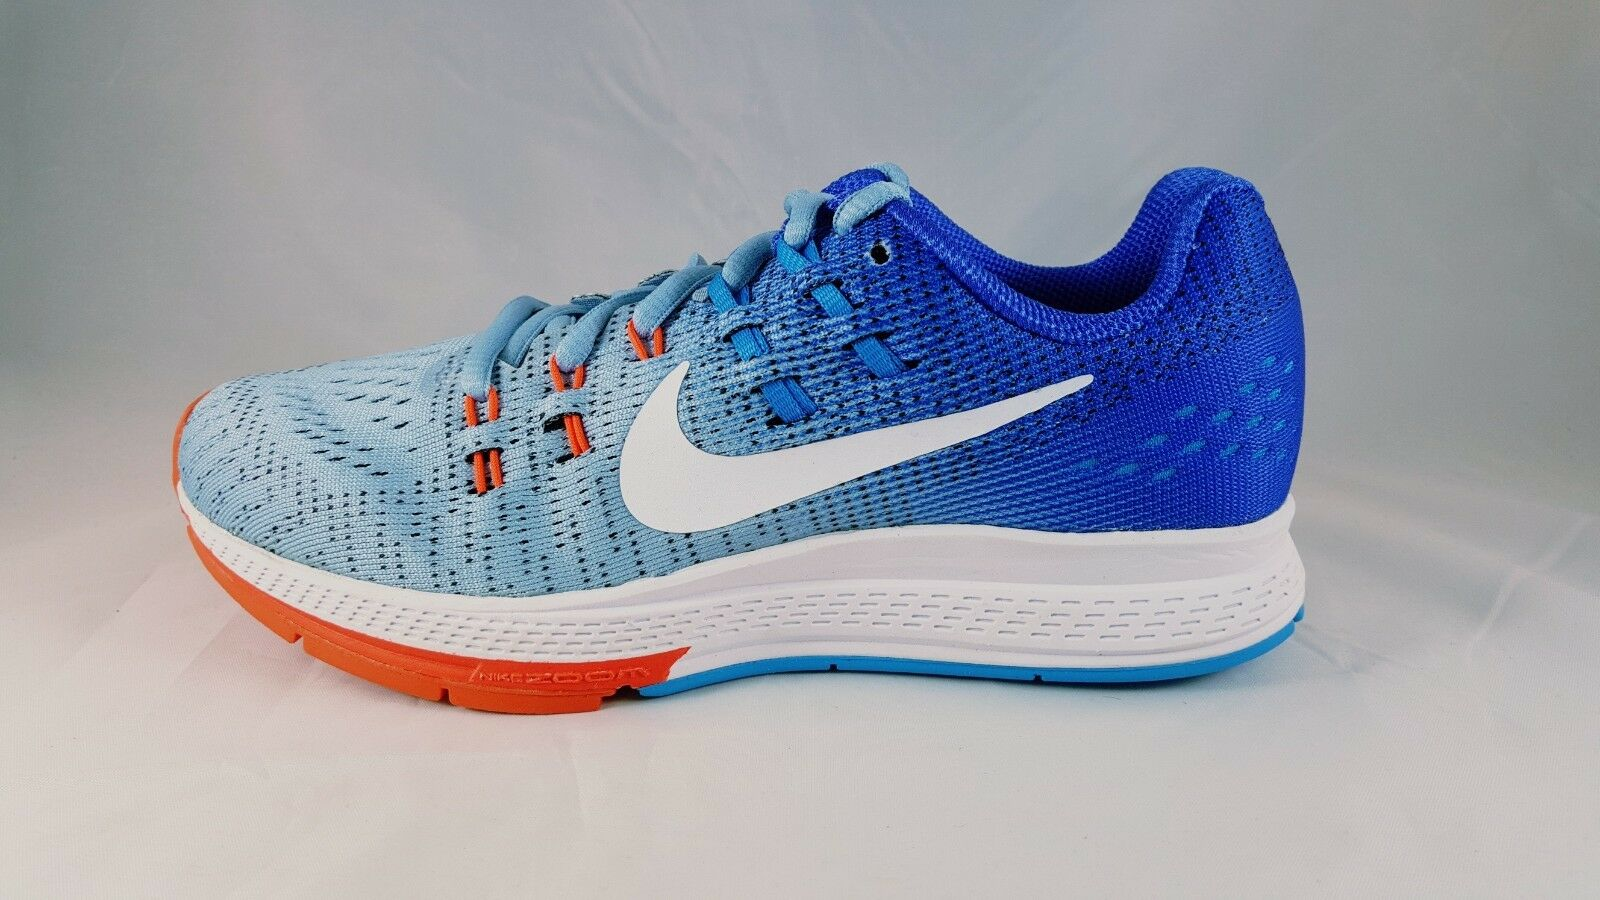 Nike Air Zoom Struttura 19 Le   Da Ginnastica 806584 401 Numero 5